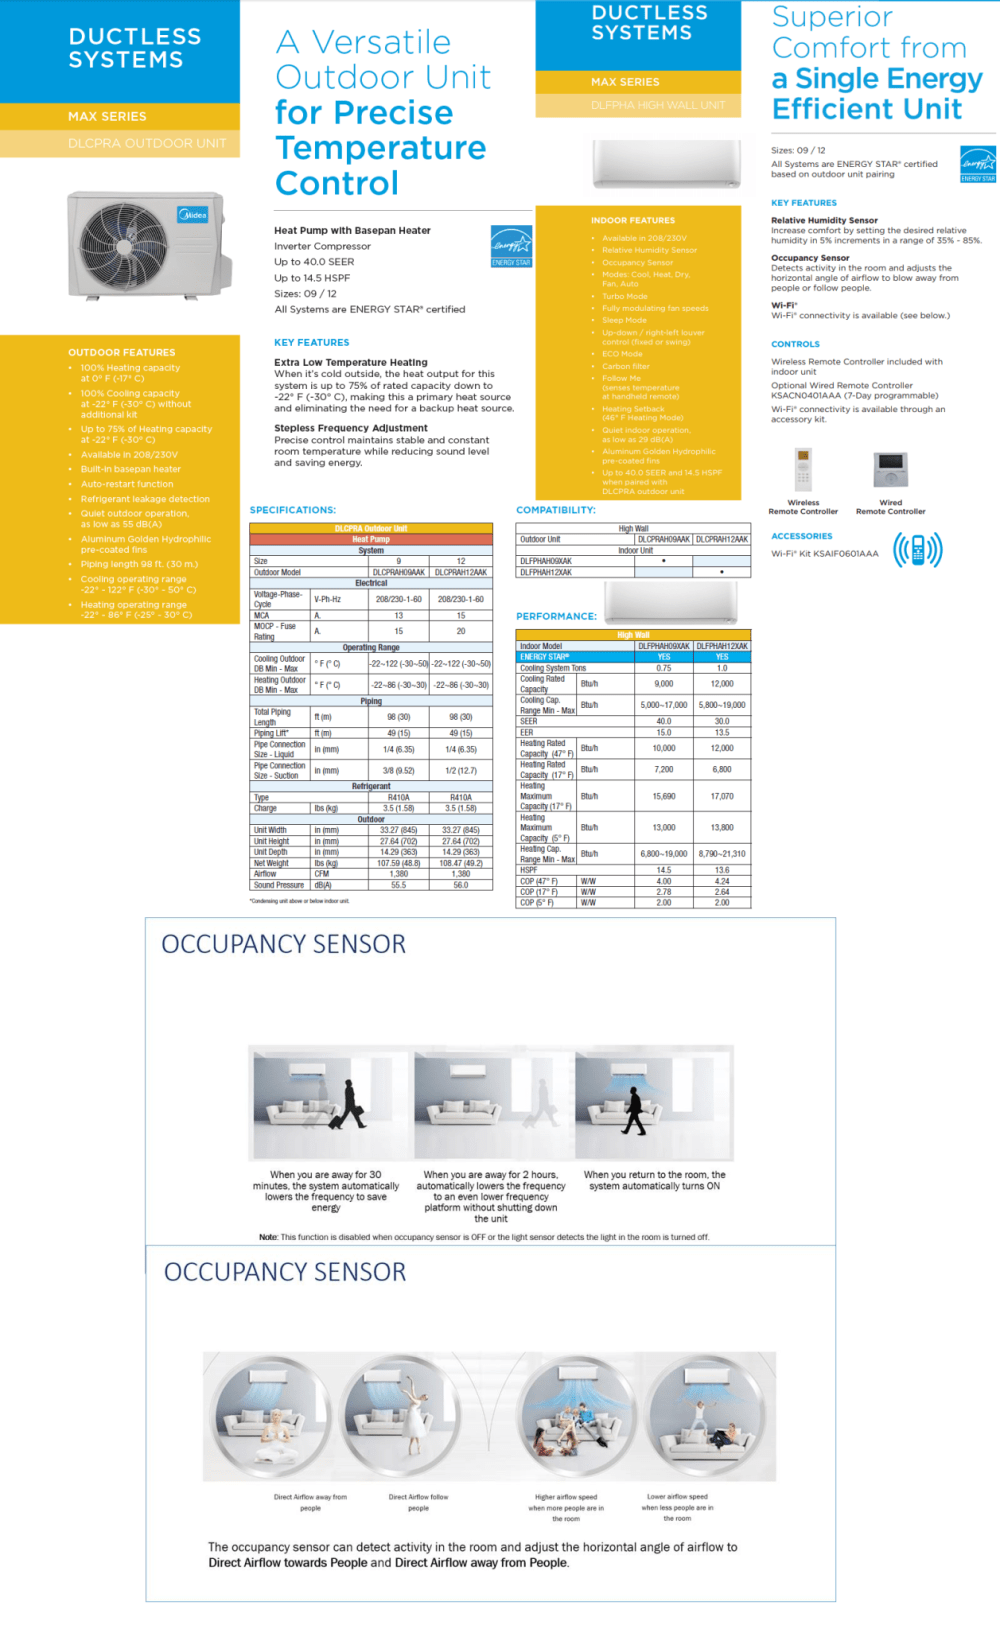 medium resolution of  gold coated coils 7yr compressor 5yr parts warranty refrigerant leak detection auto restart